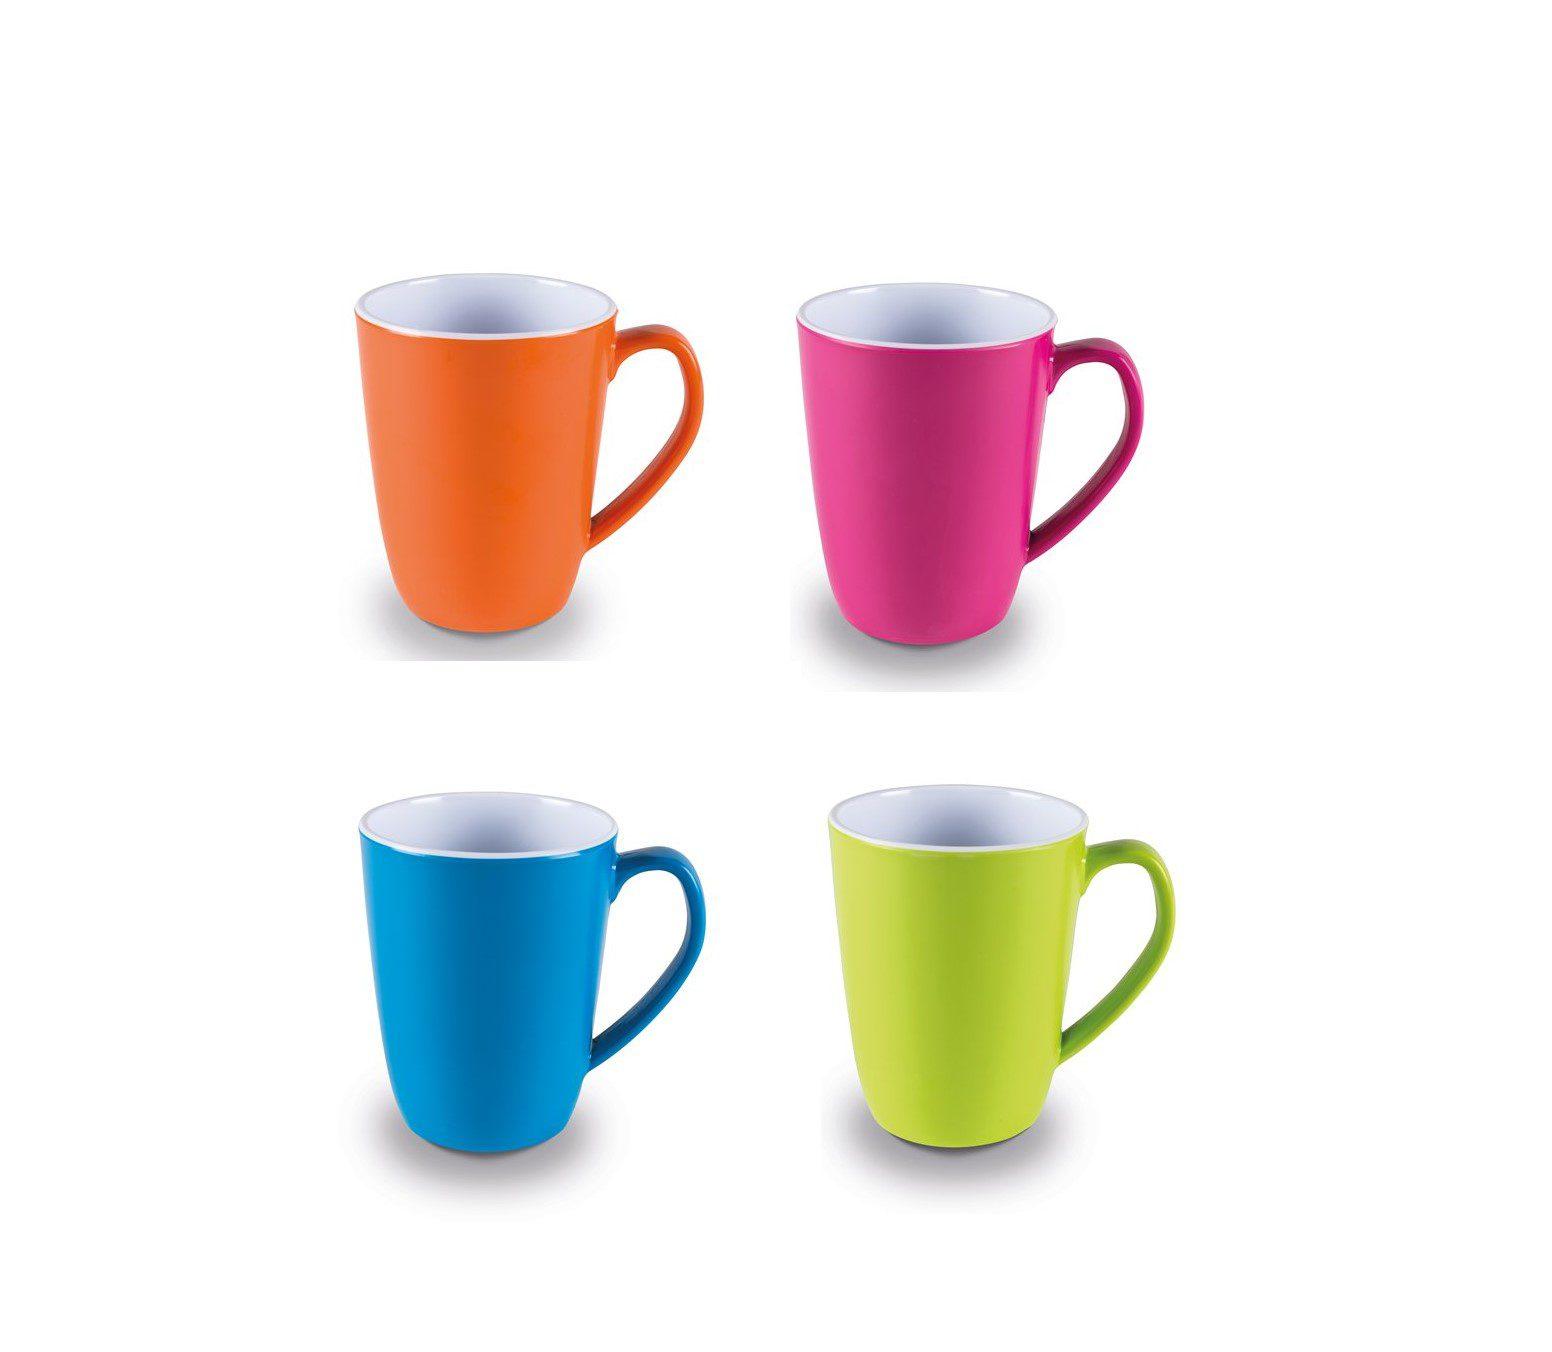 Kampa Summer Mug Set - Mixed Colour